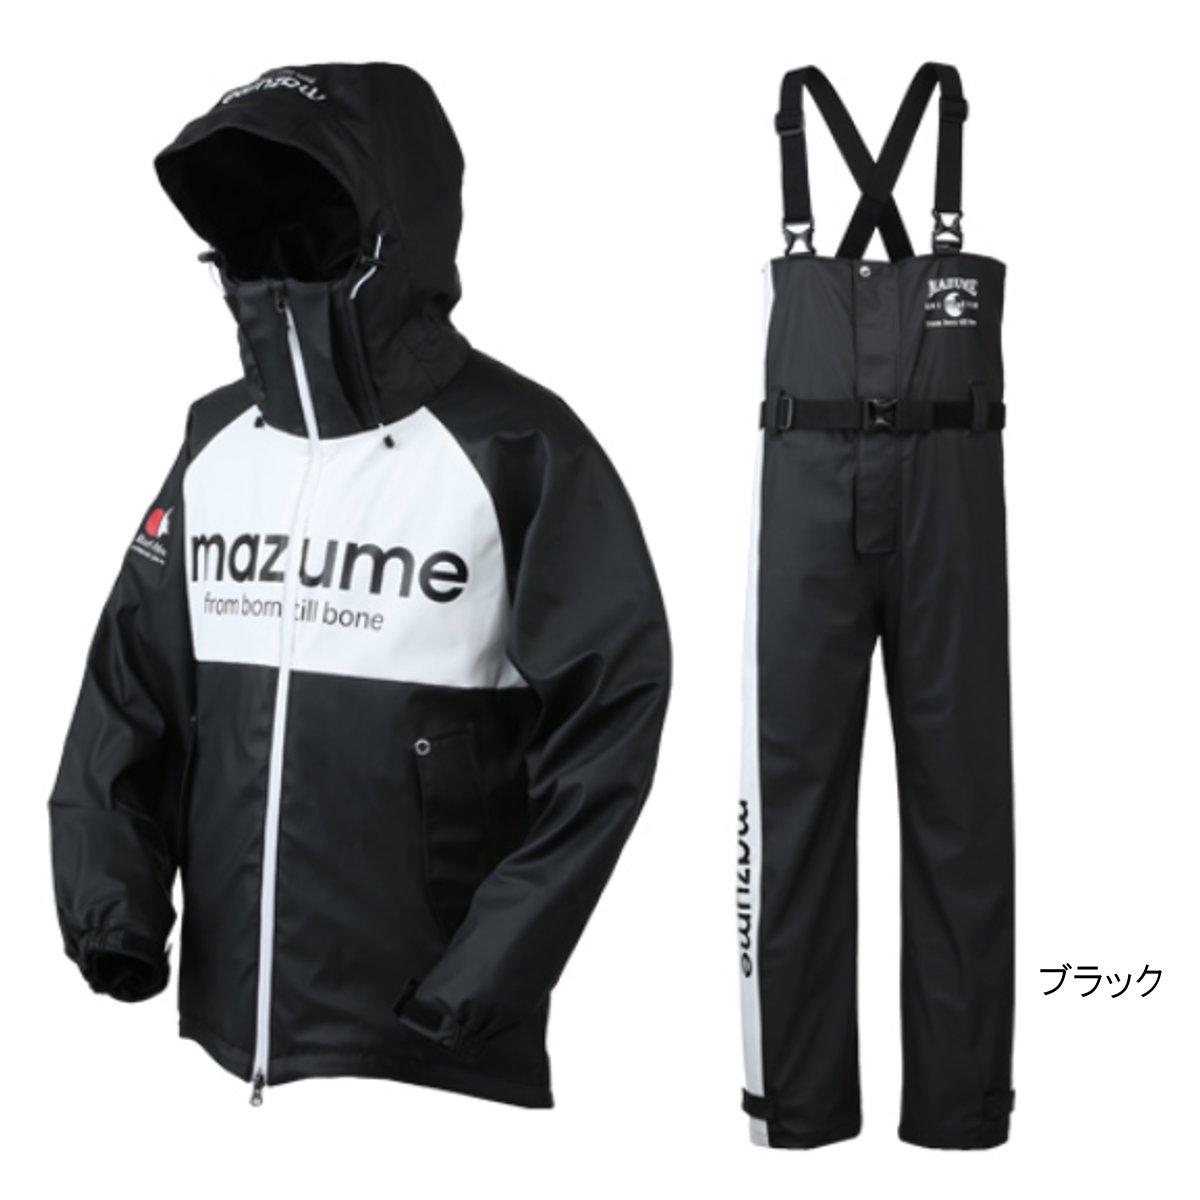 mazume ROUGH WATER レインスーツ II MZRS-383 LL ブラック【送料無料】